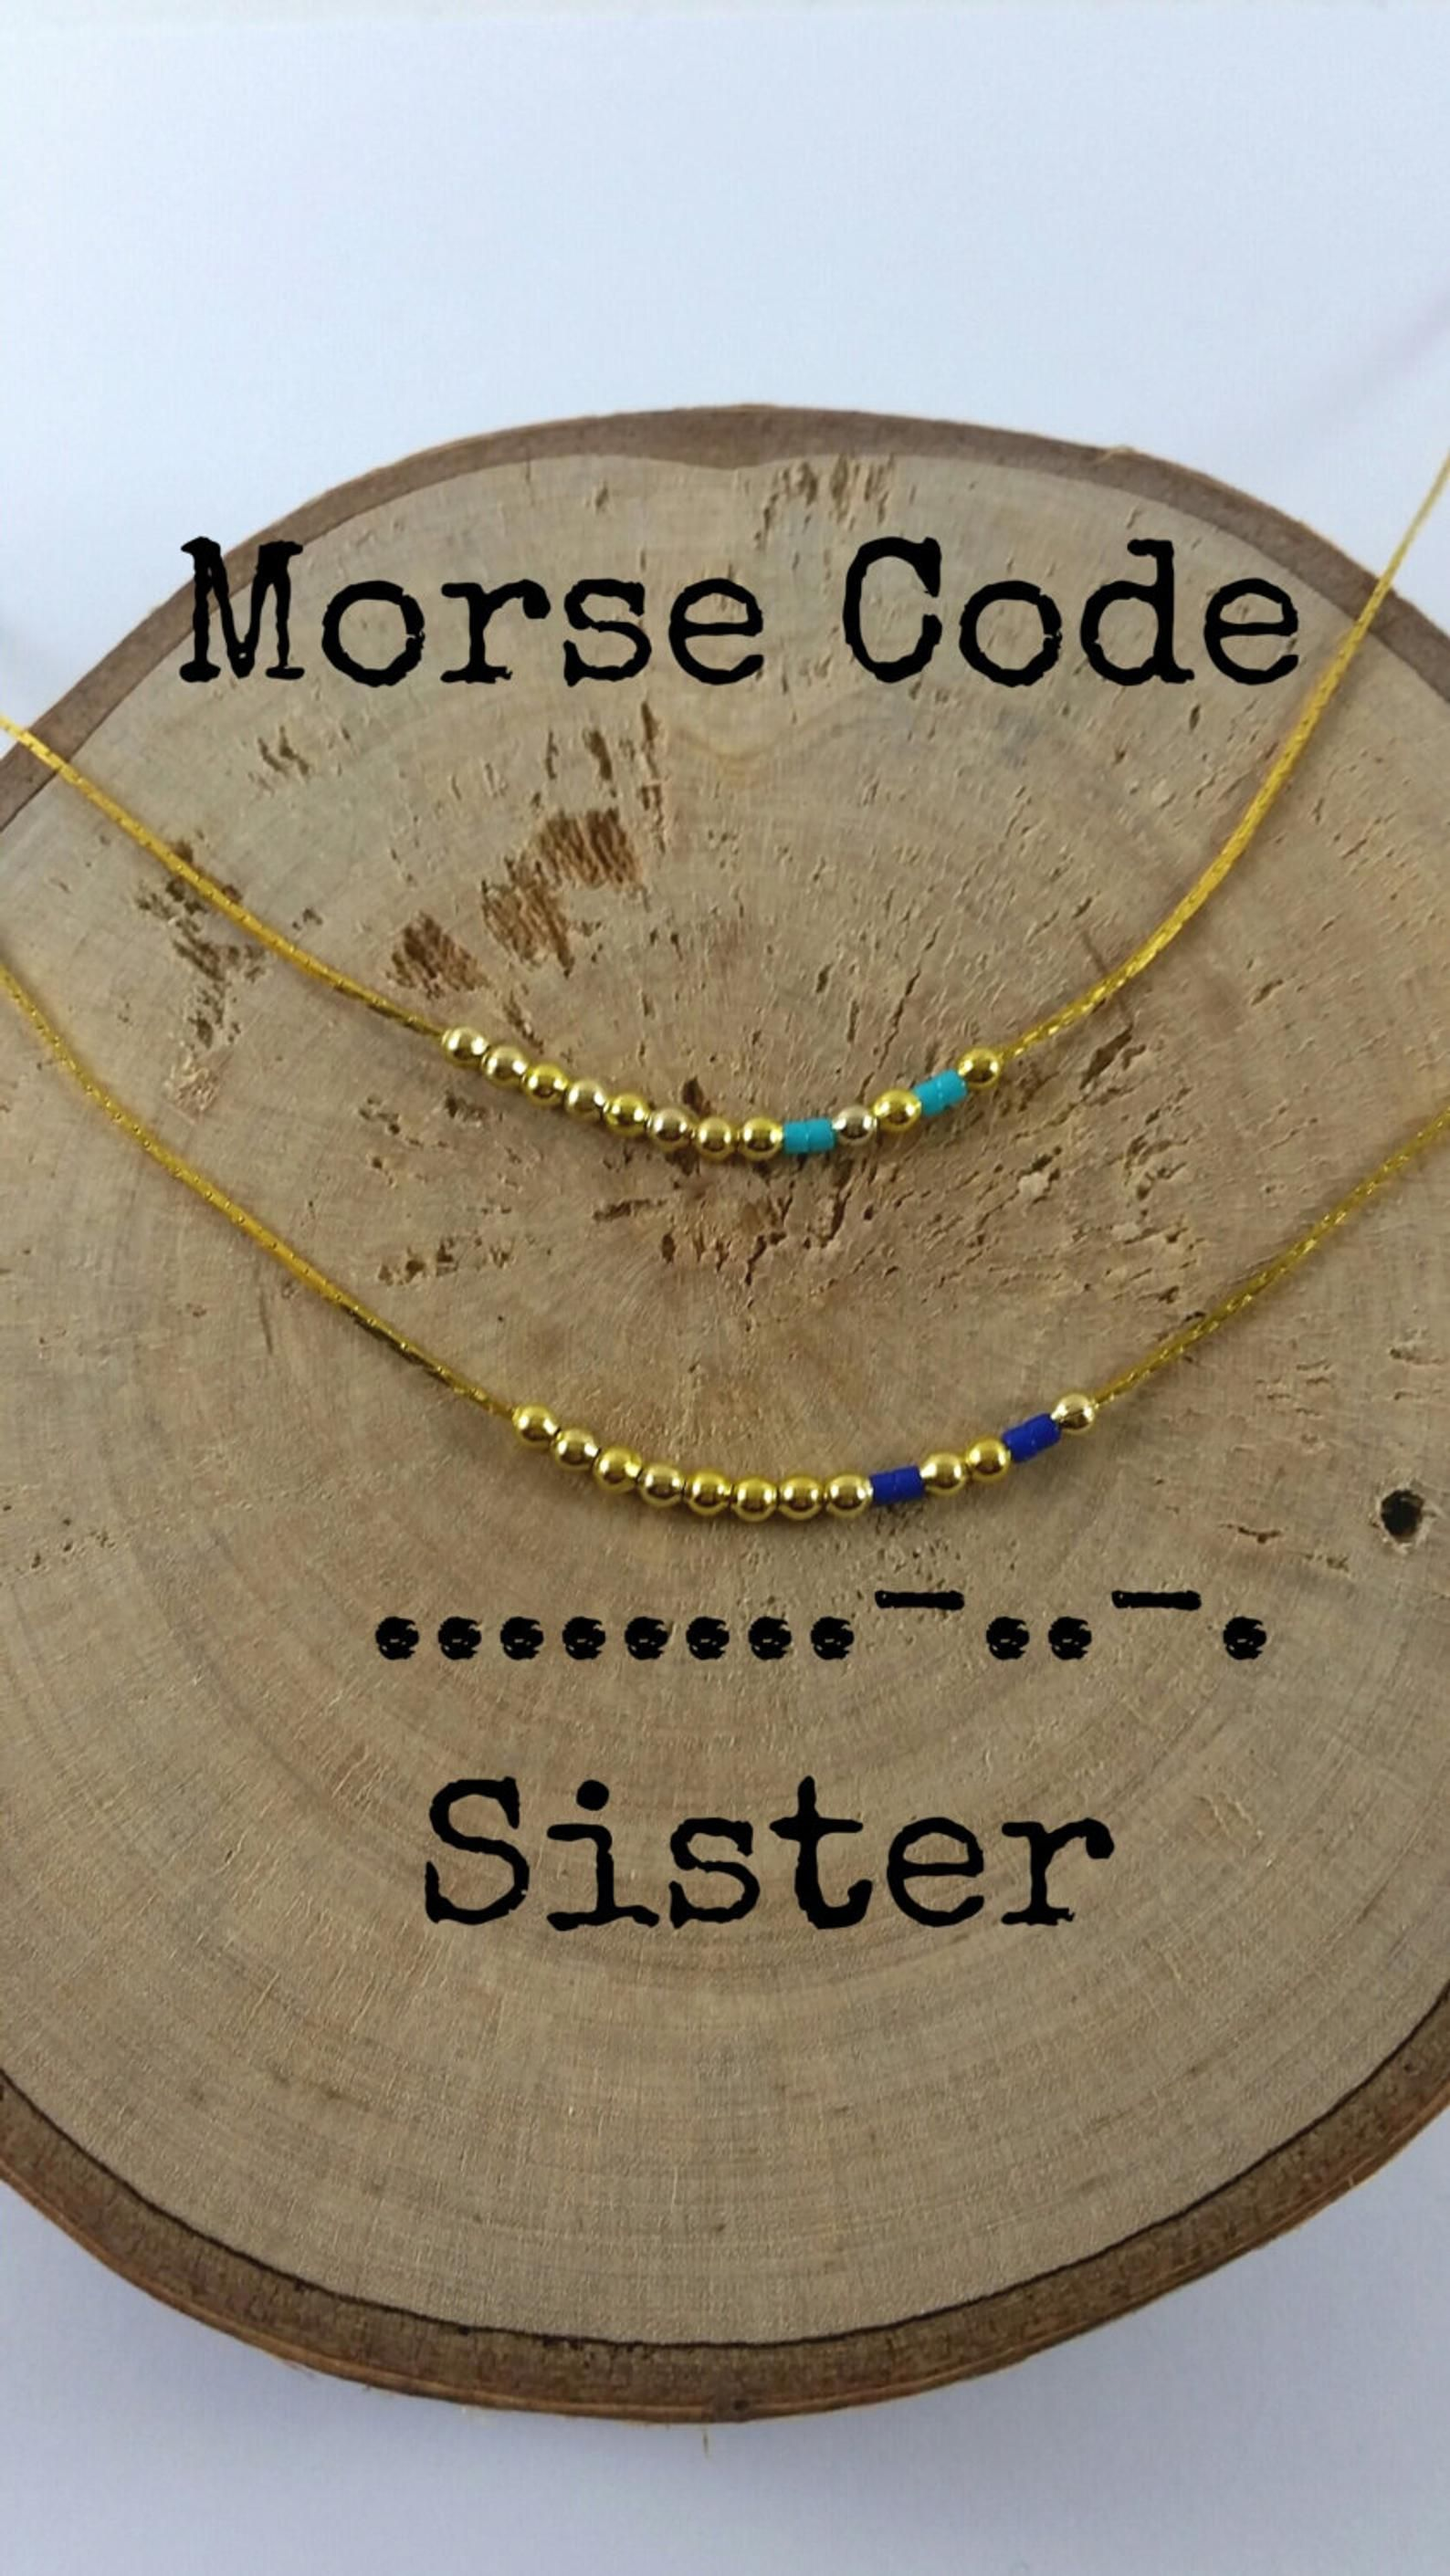 Set Of 2 Sister Morse Code Necklaces Secret Message